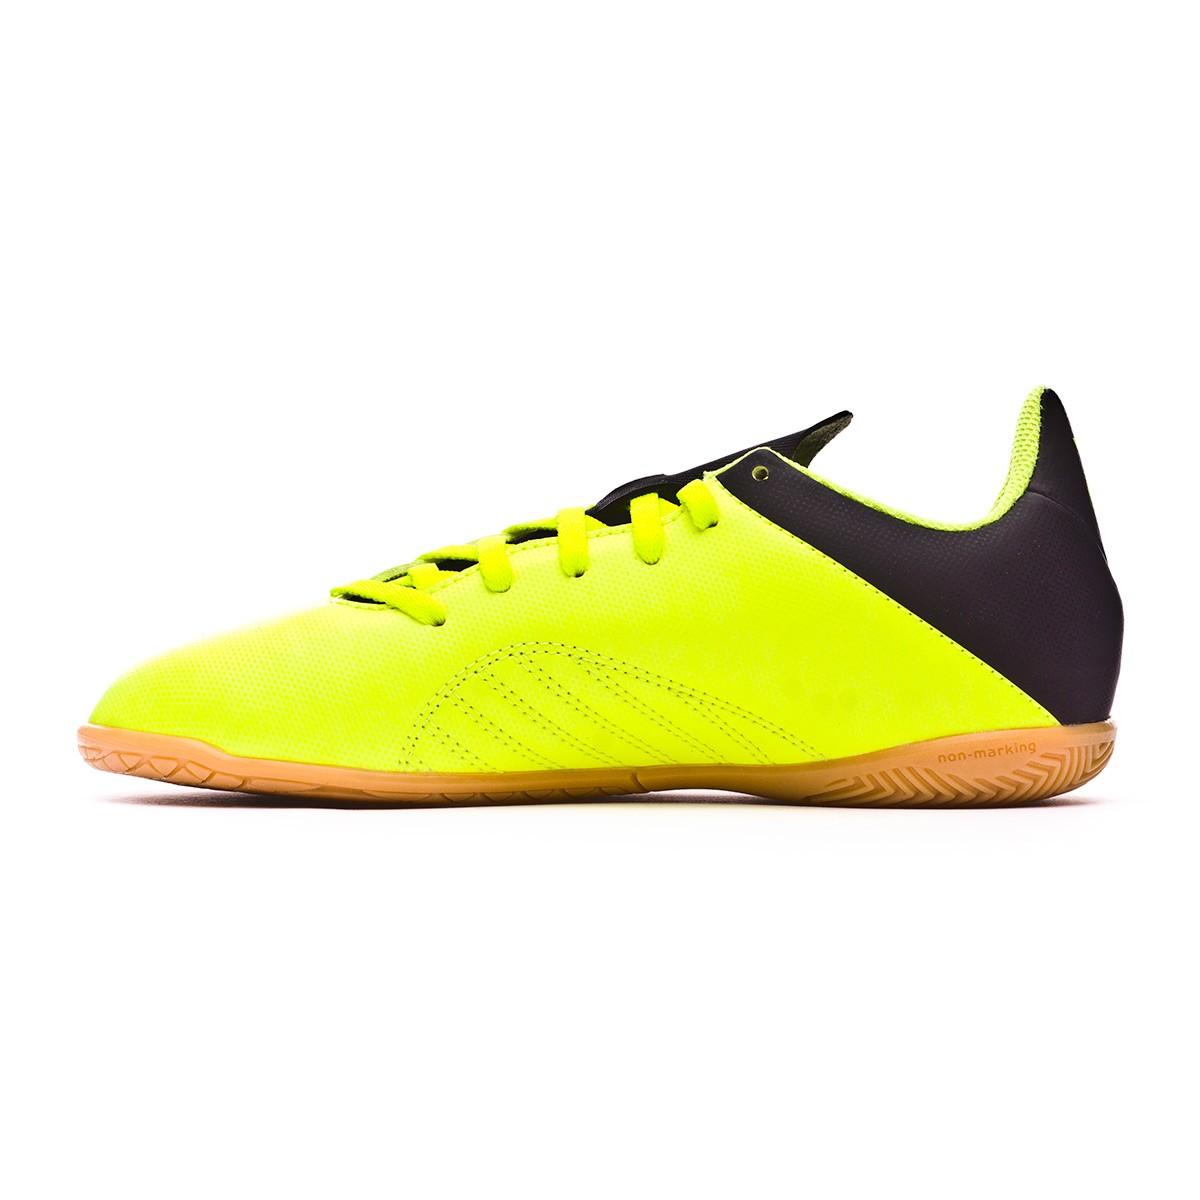 61defc05 Futsal Boot adidas Kids X Tango 18.4 IN Solar yellow-Core black-Solar  yellow - Tienda de fútbol Fútbol Emotion